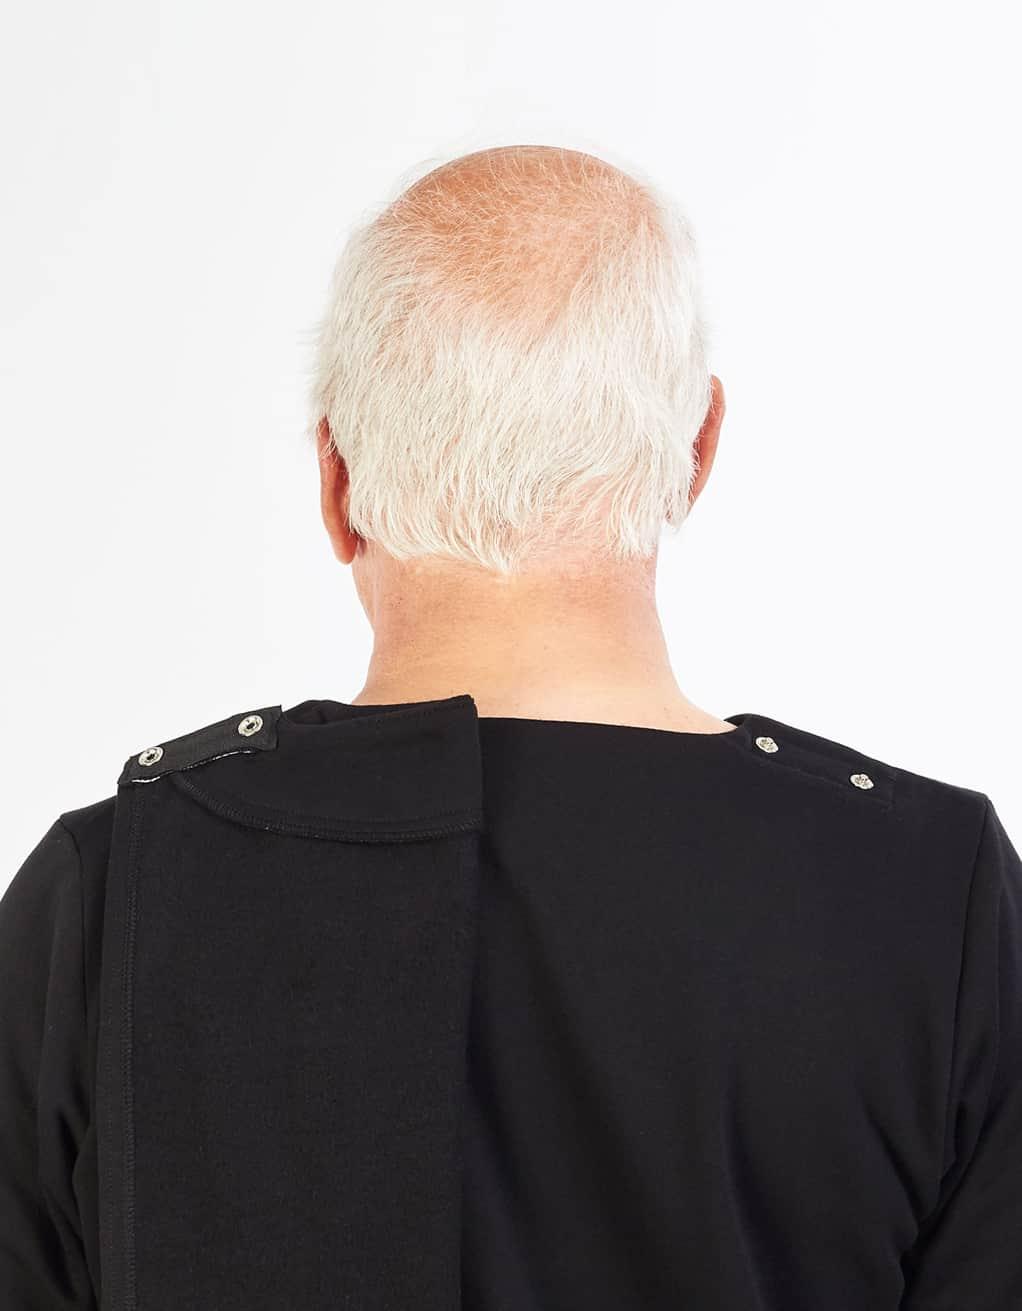 veste-adaptee-pour-homme-HJ14363-back-black